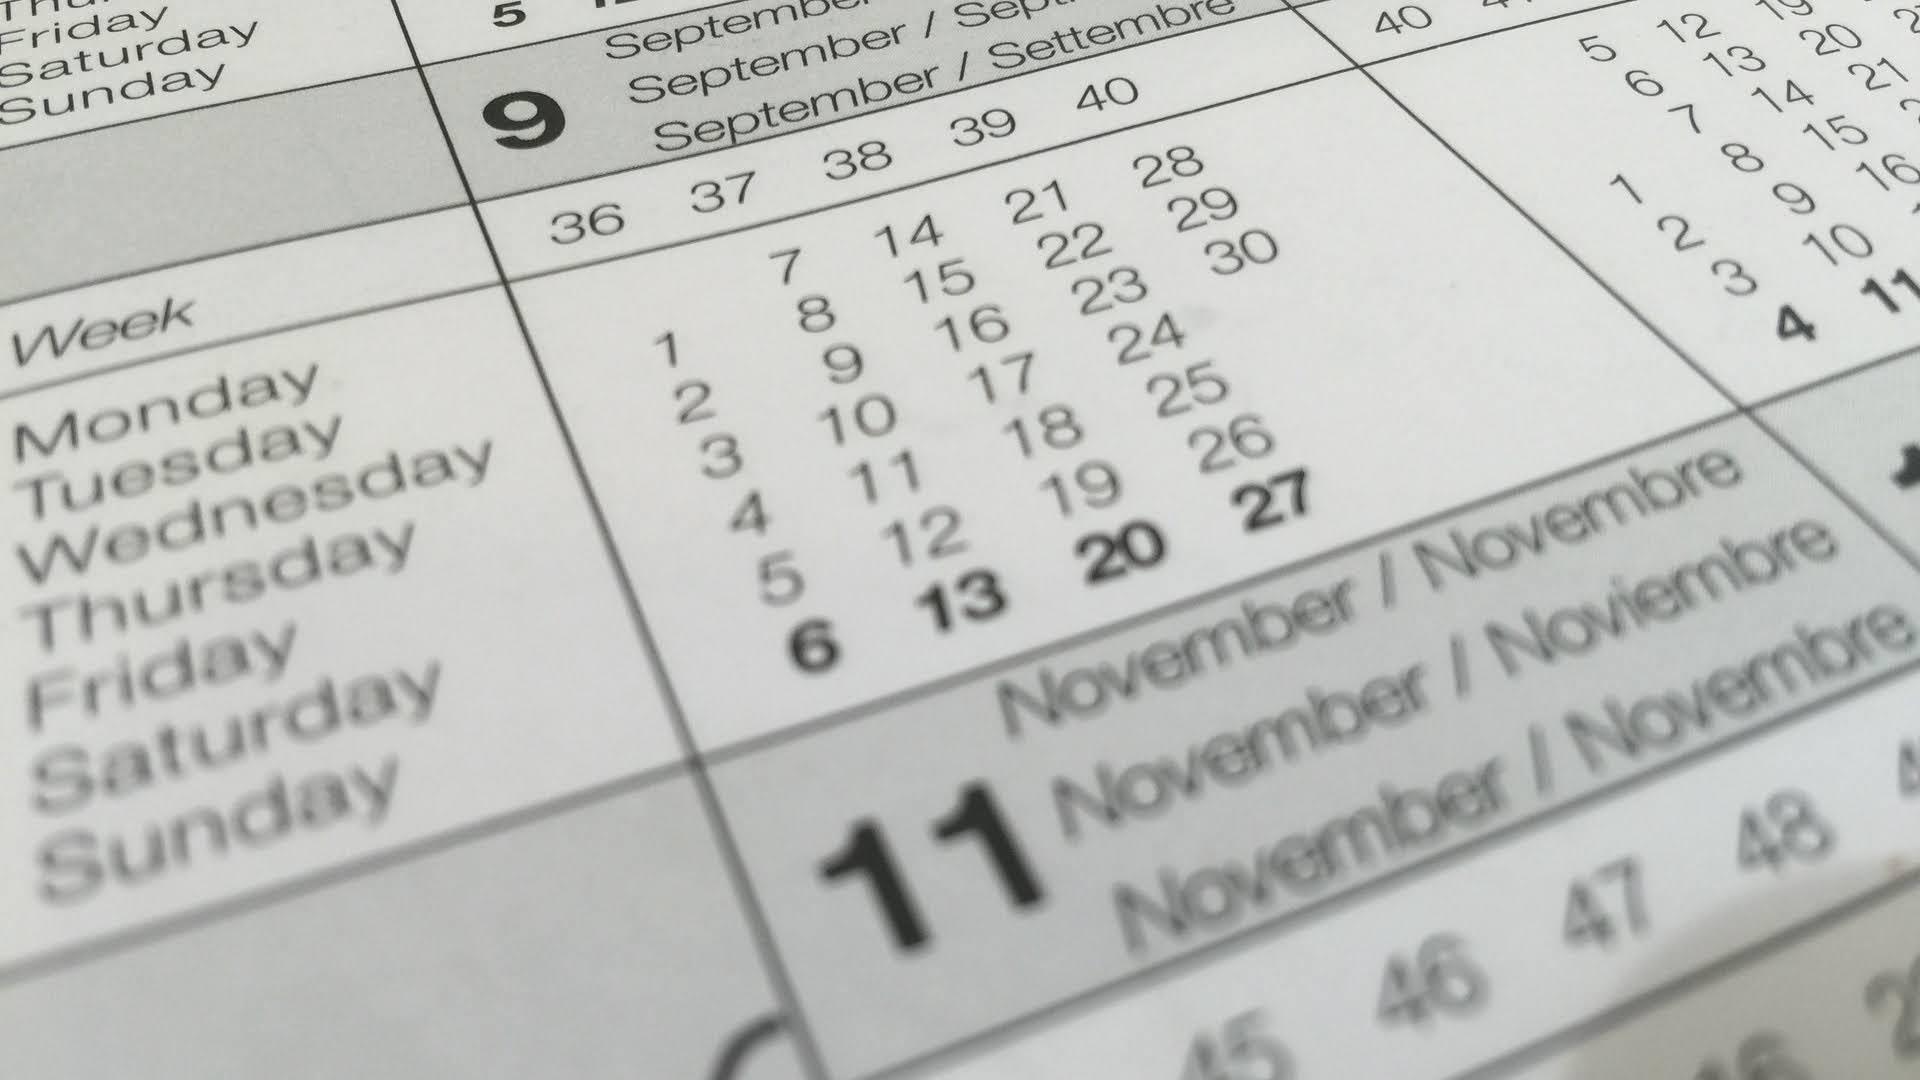 calendar-pexels-16-9.jpg